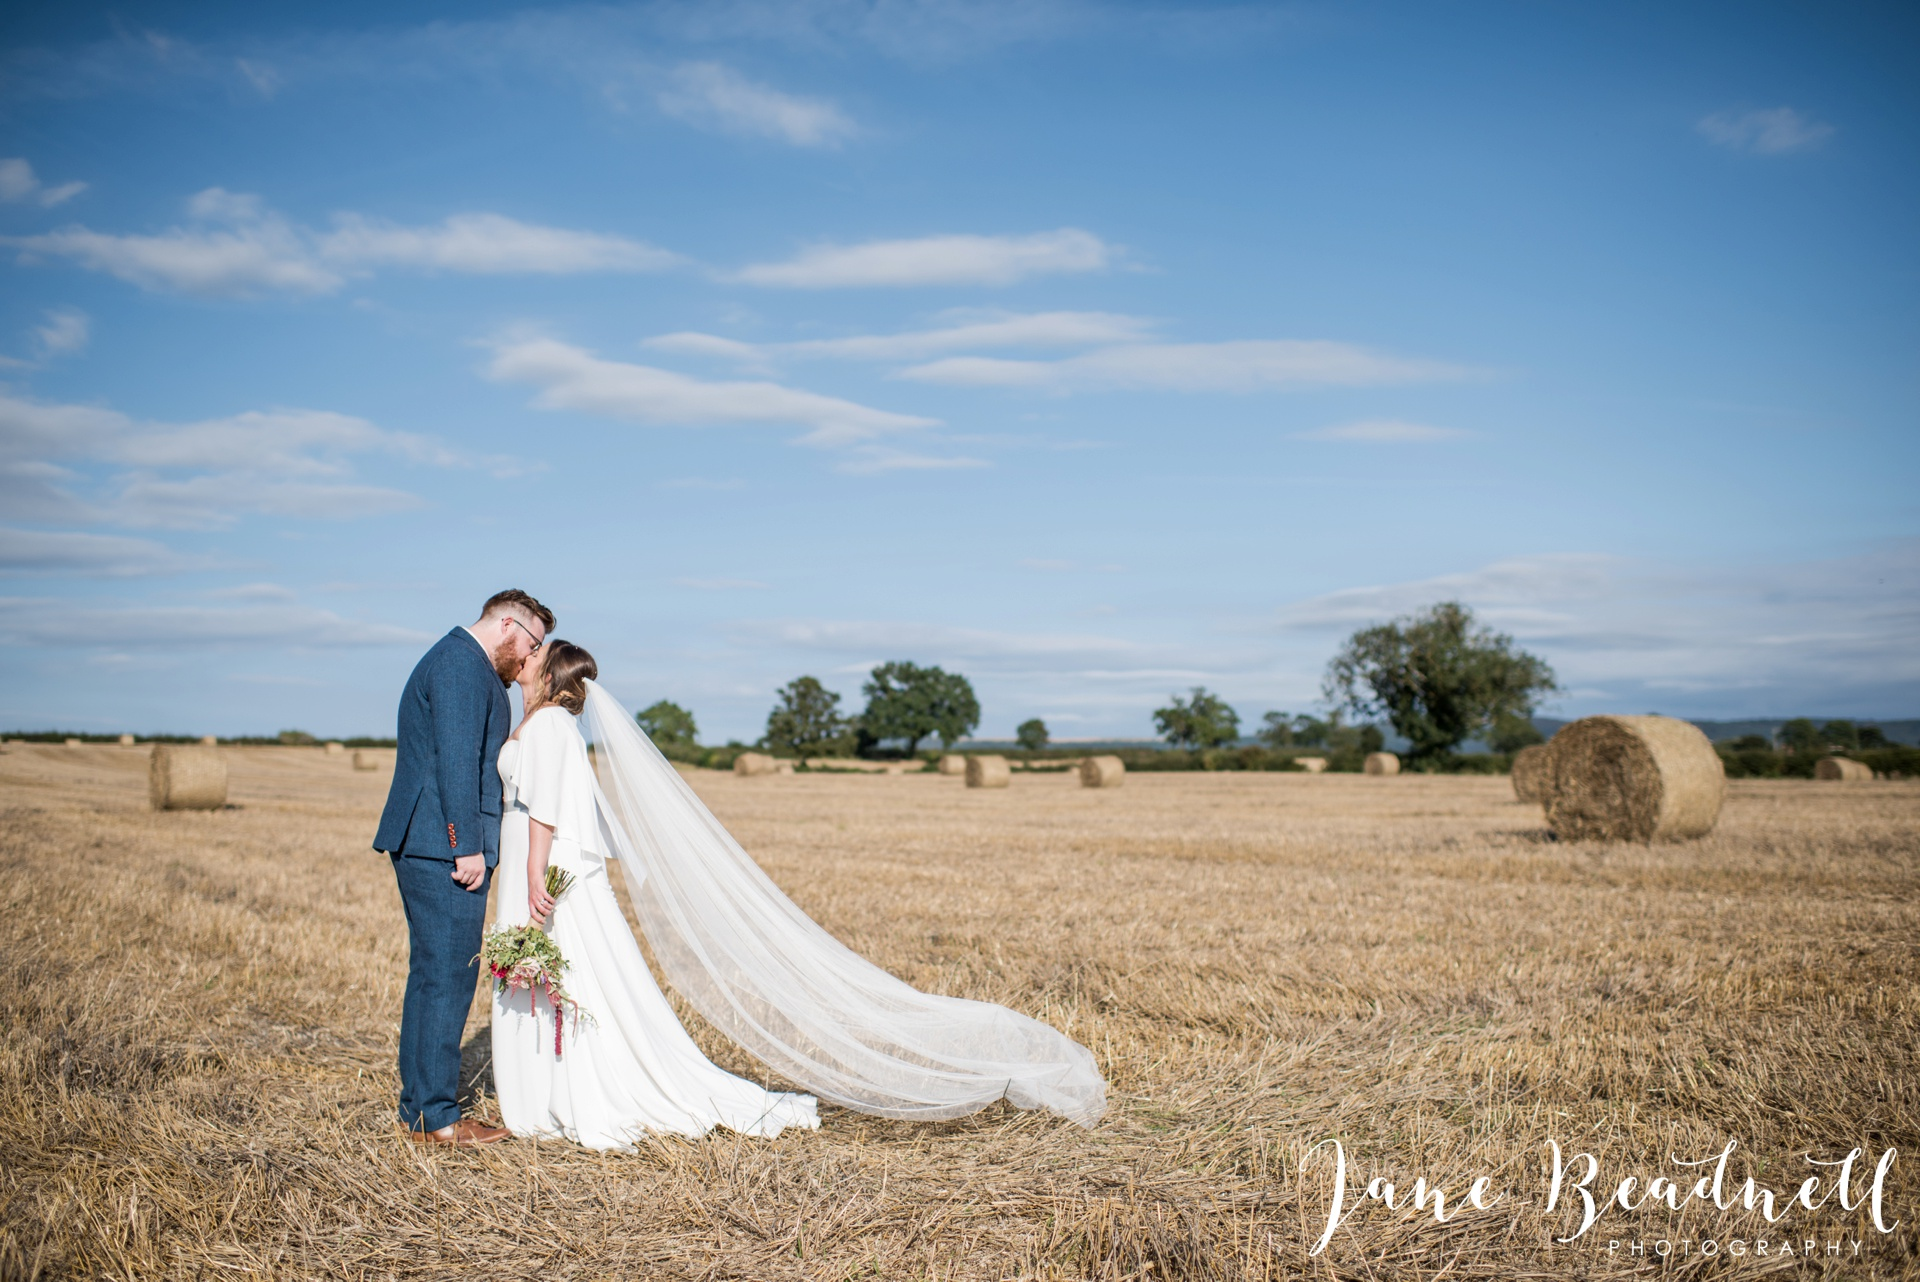 yorkshire-fine-art-wedding-photographer-jane-beadnell-photography_0002